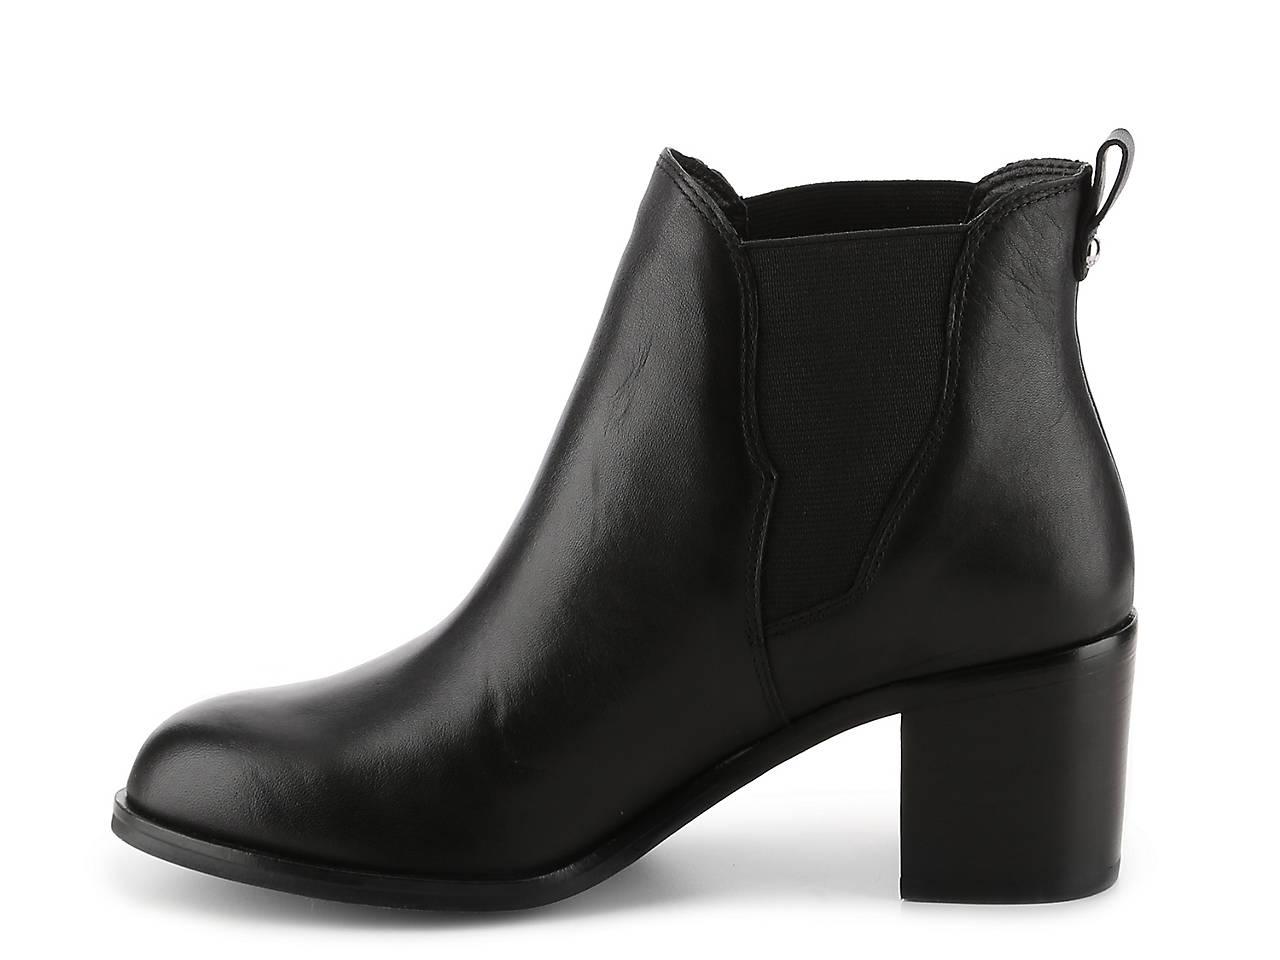 b8daba4f5 Sam Edelman Justin Chelsea Boot Women s Shoes